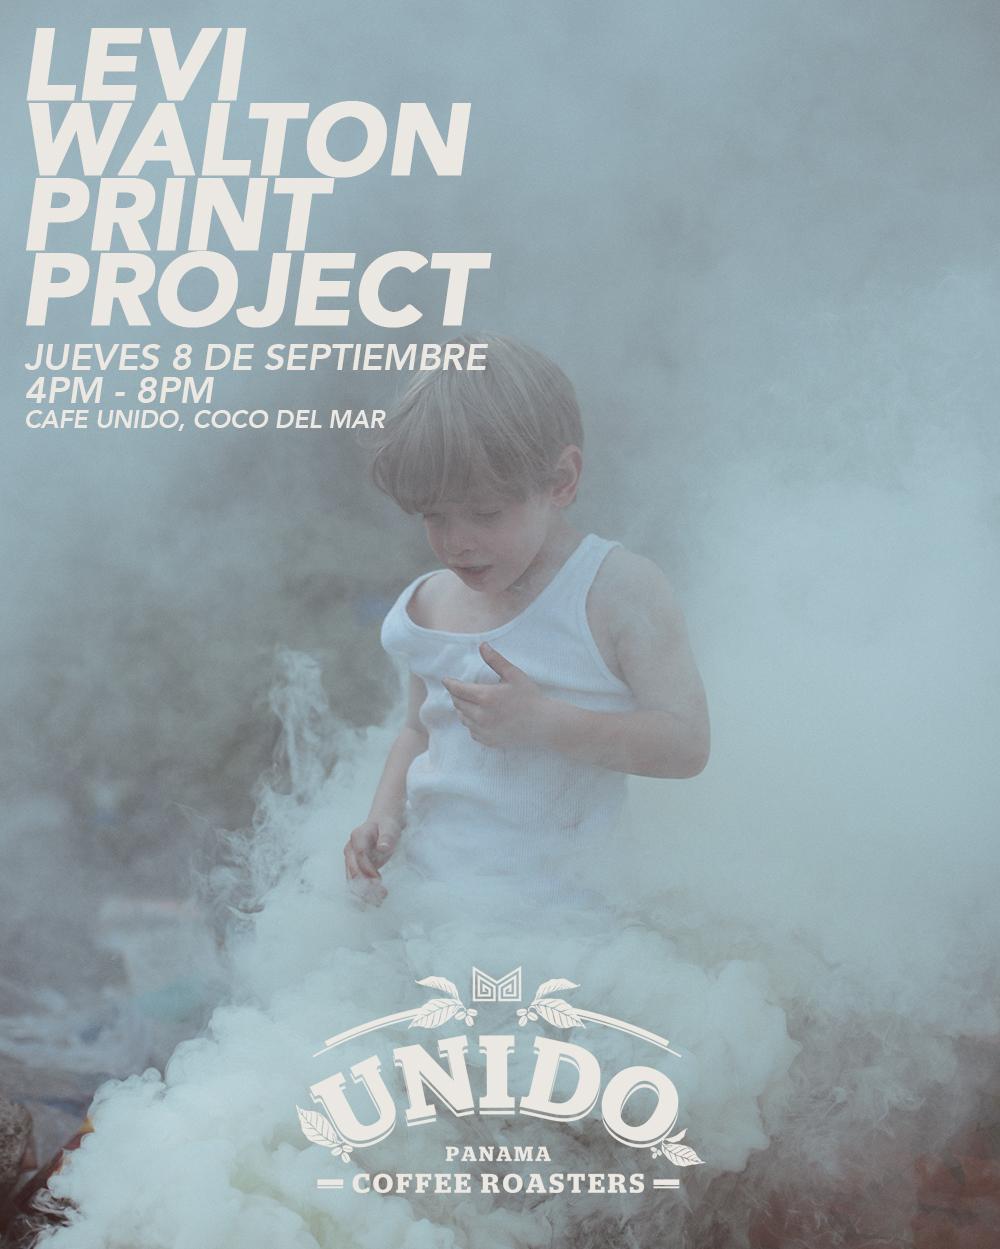 Levi Walton Print Project: Print signing event held in Panama City, Panama